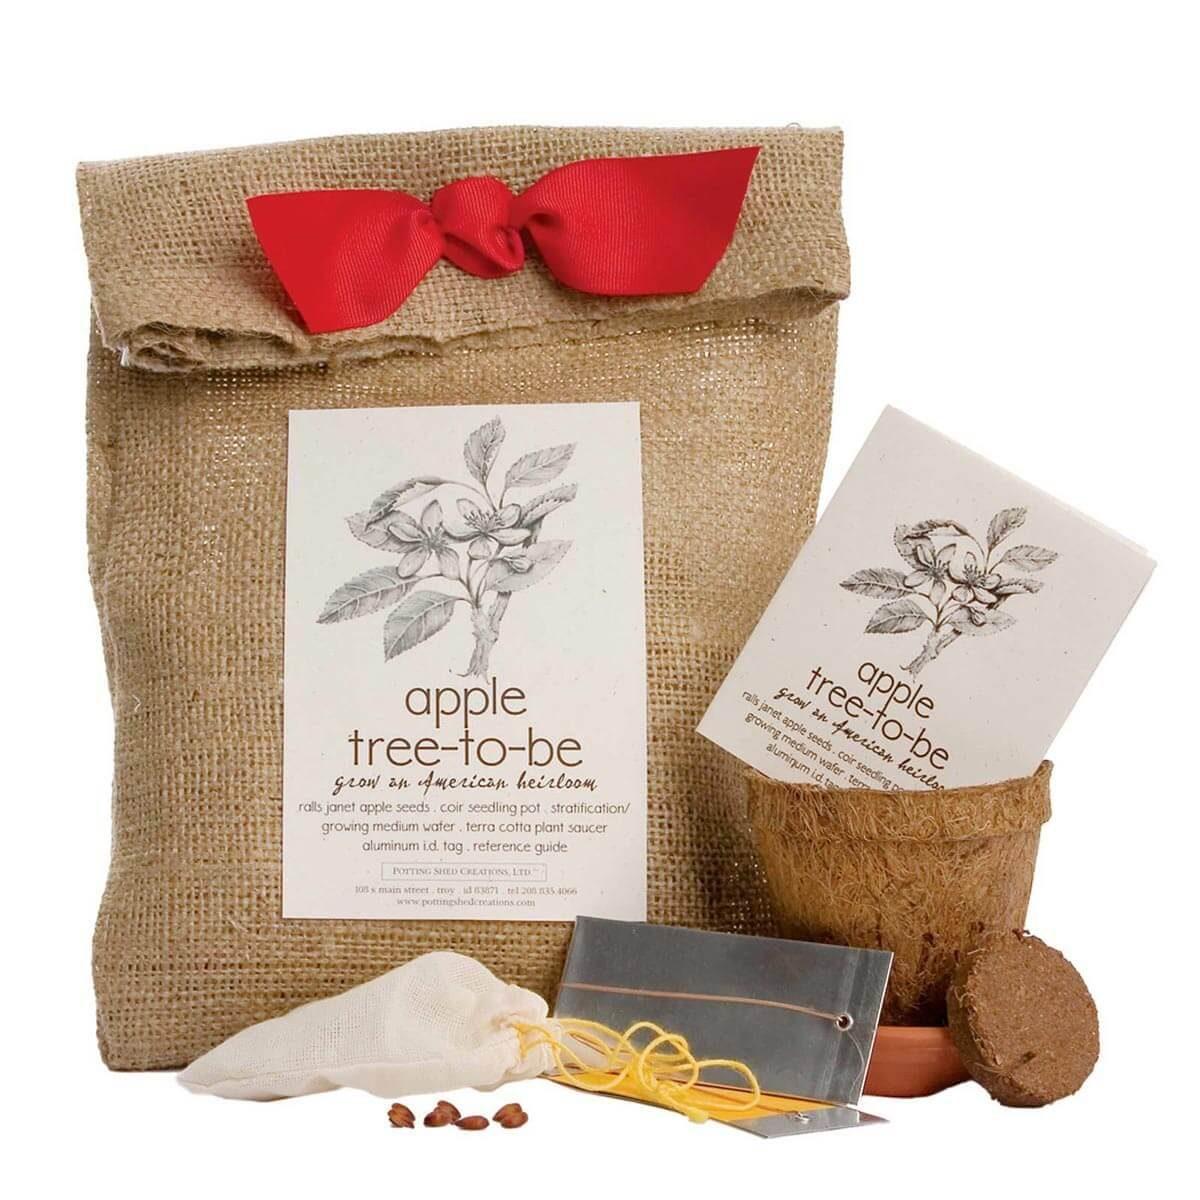 apple tree planting kit gift _05